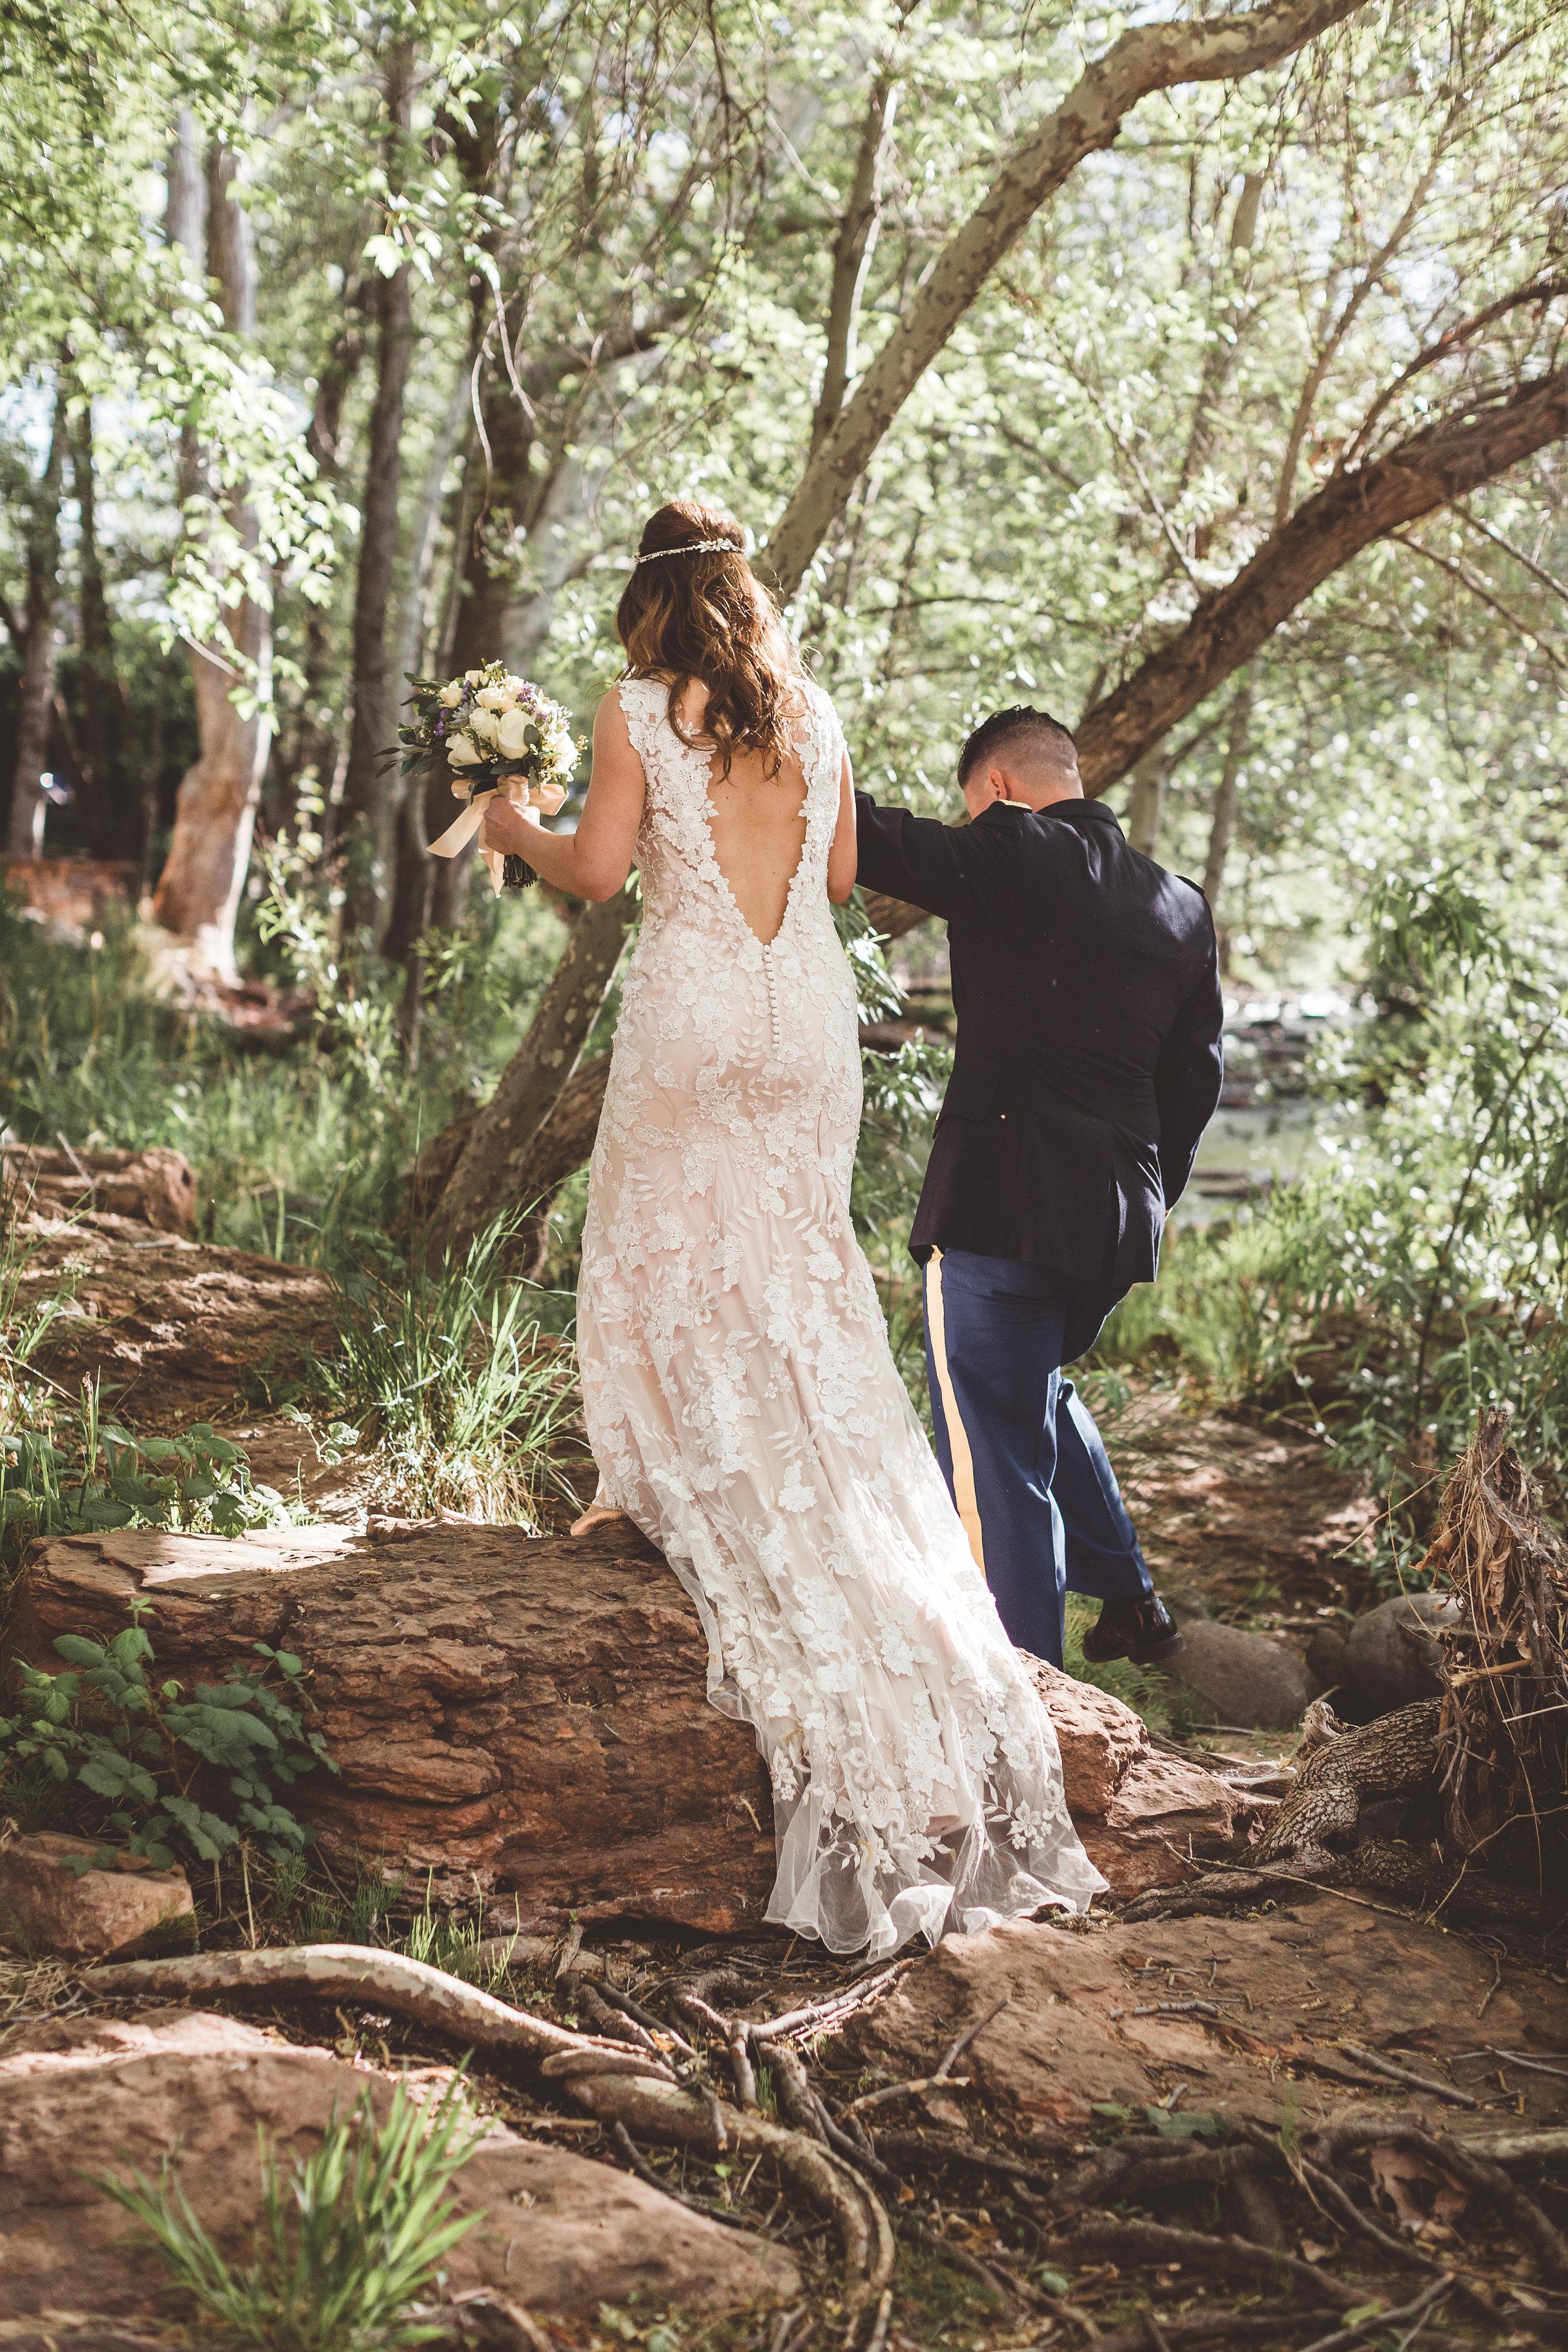 jenna-and-erics-romantic-sedona-wedding34.jpg